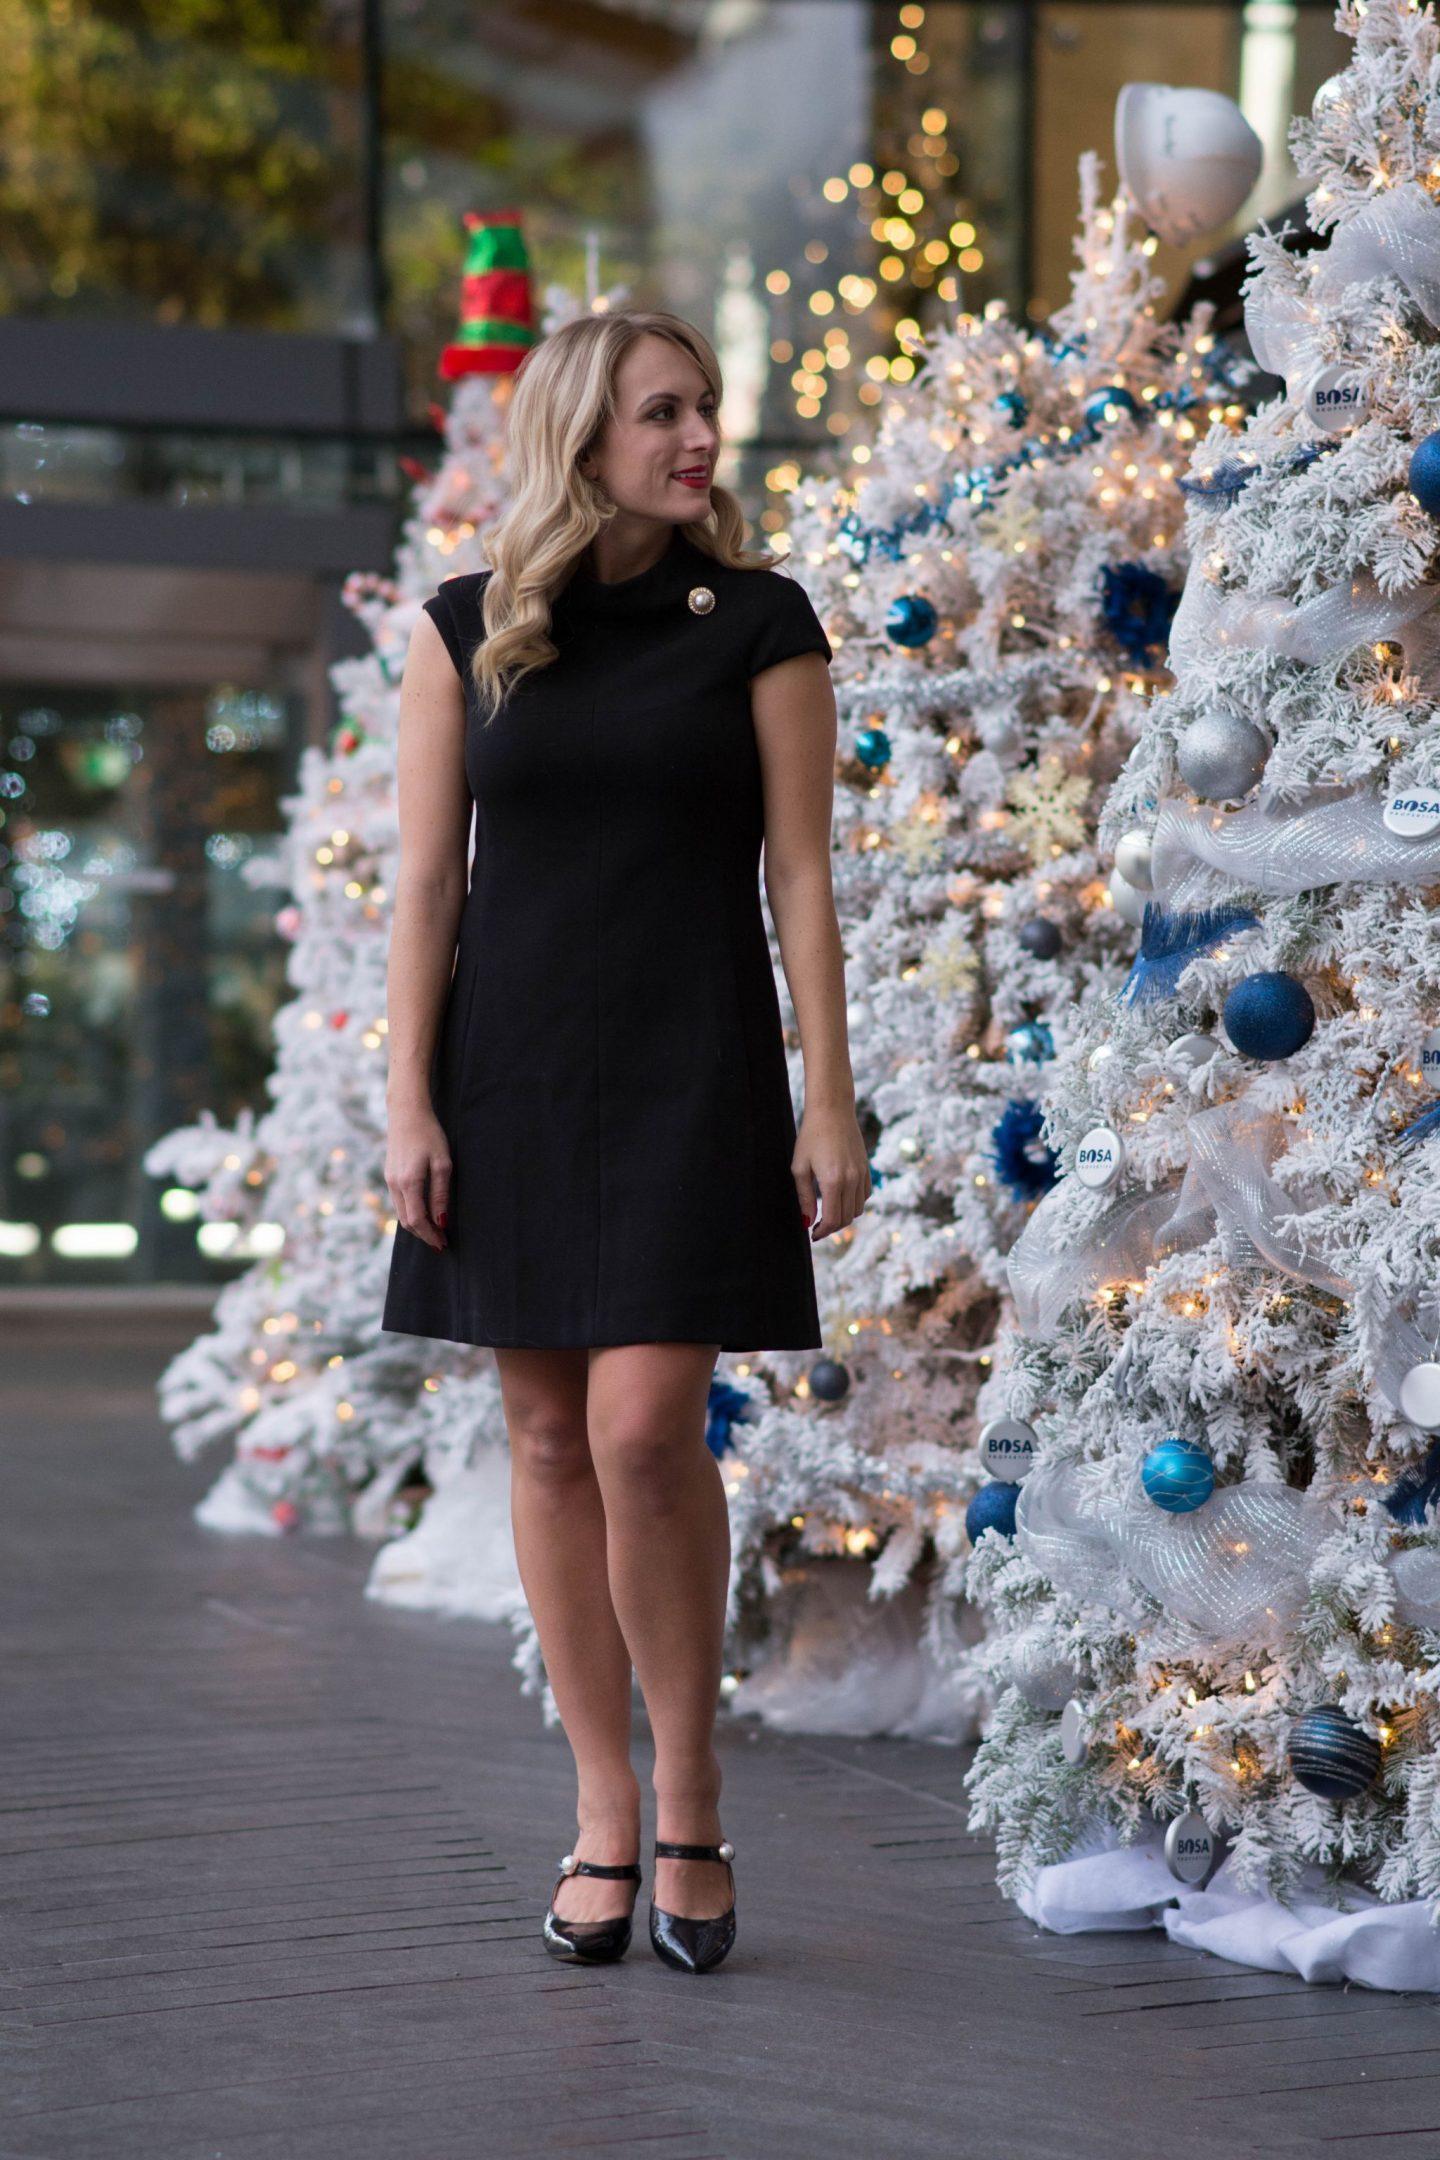 harper-rose-dress-legallee-blonde-wearing-black-a-line-dress-with-pearl-detail